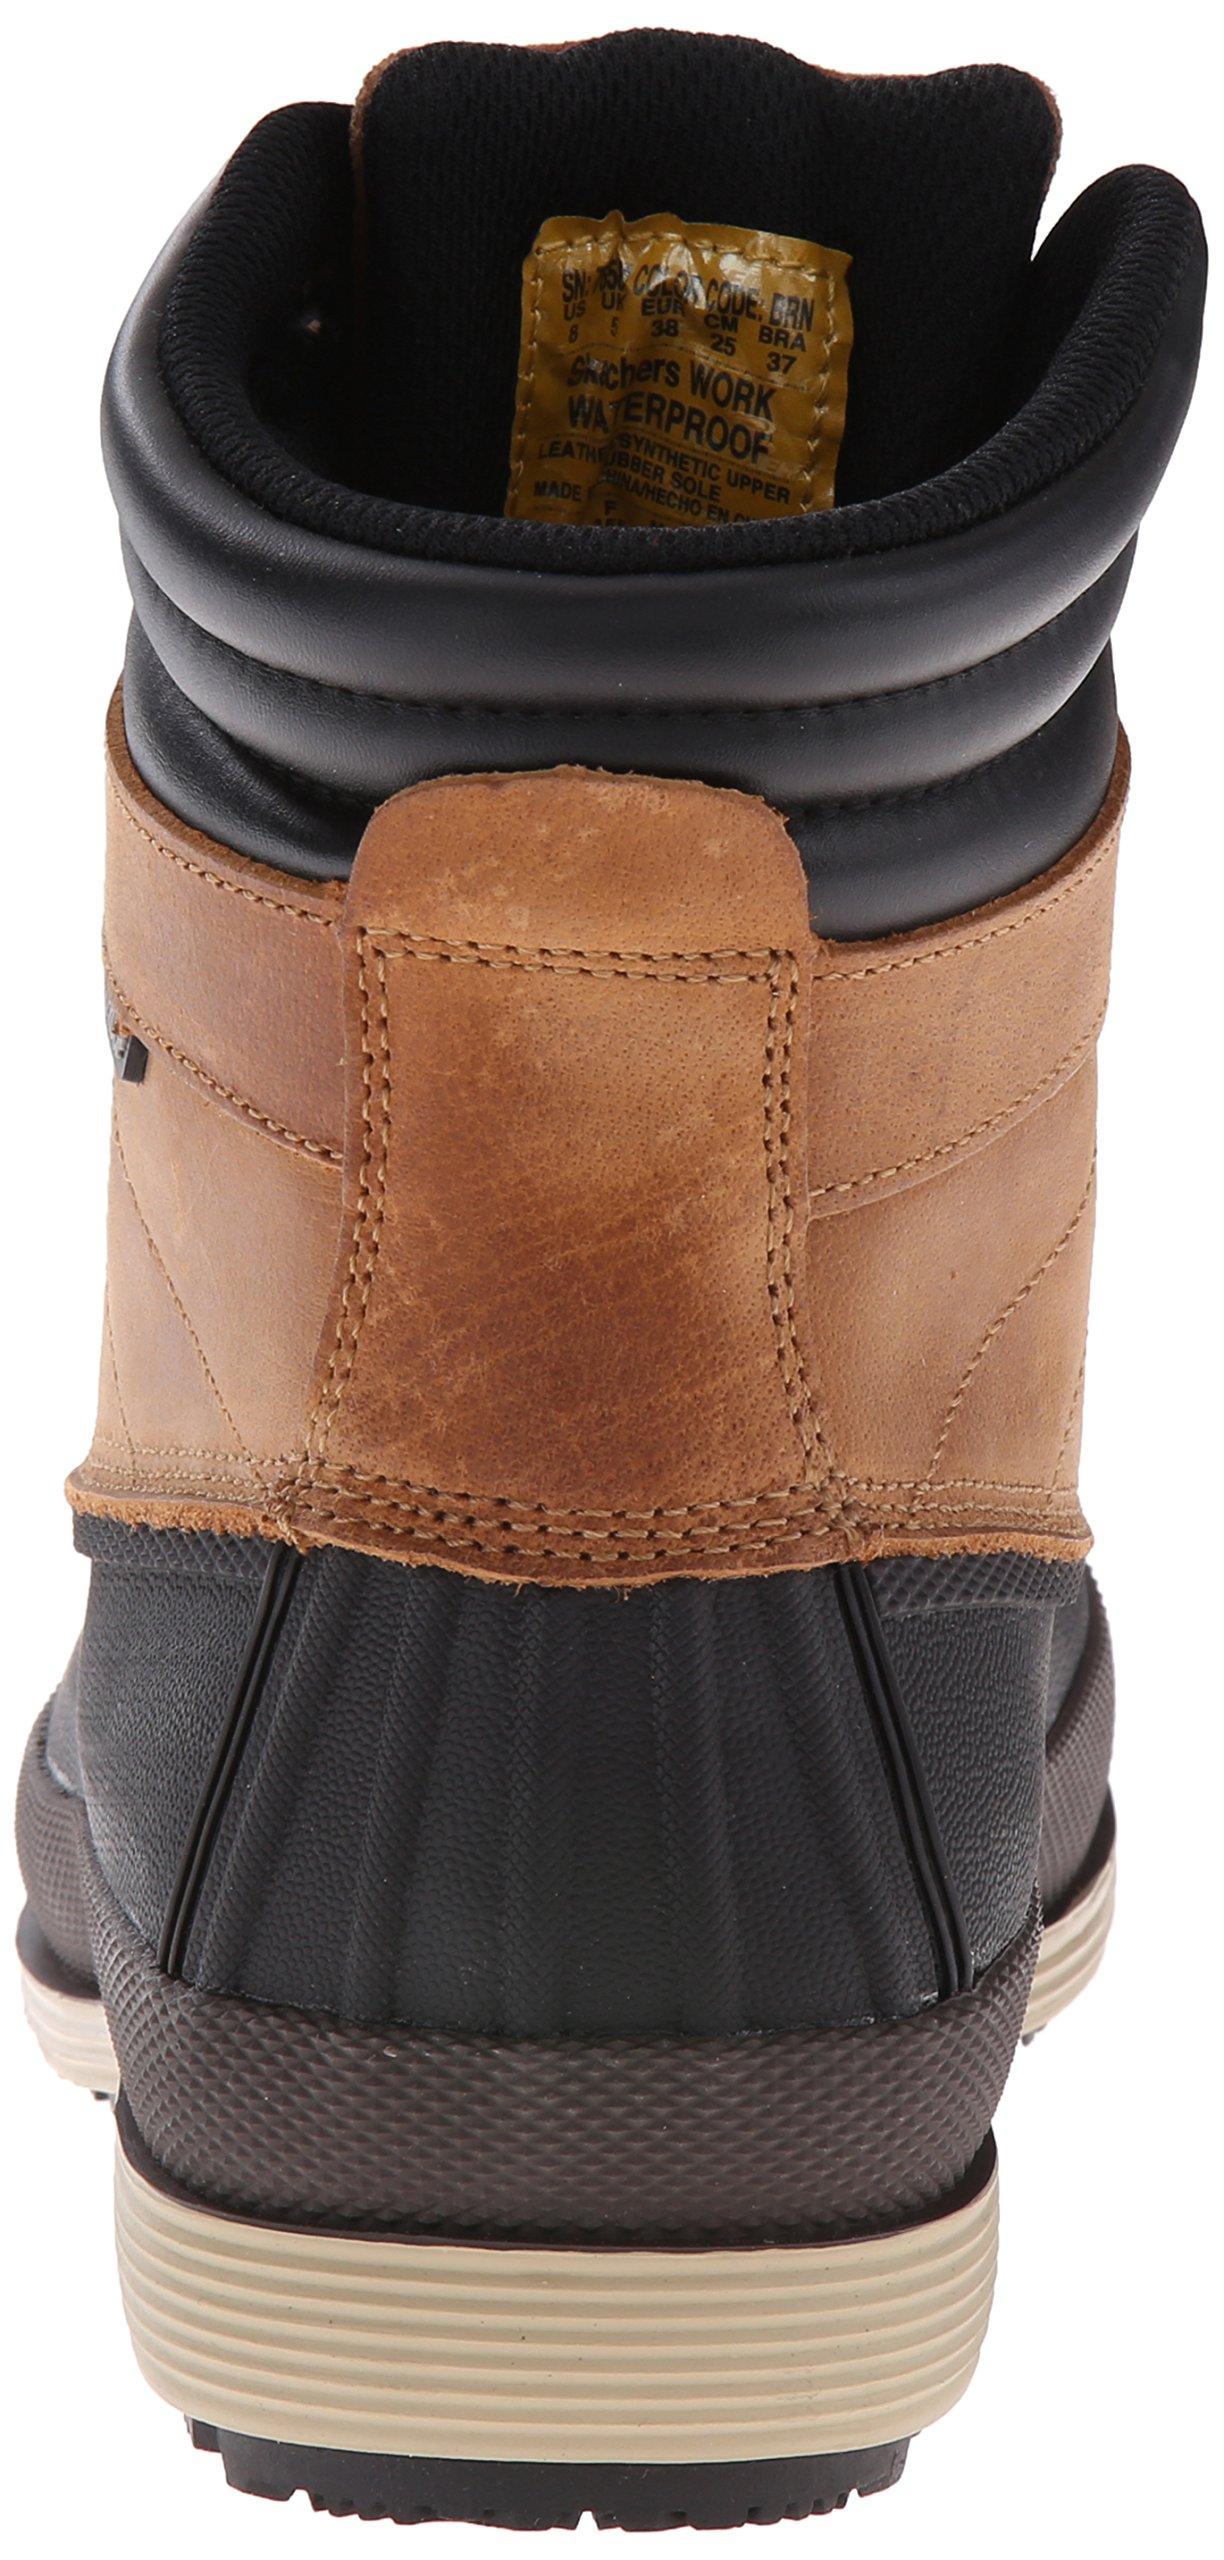 Skechers for Work Women's Duck Rain Boot, Brown, 5.5 M US by Skechers (Image #2)